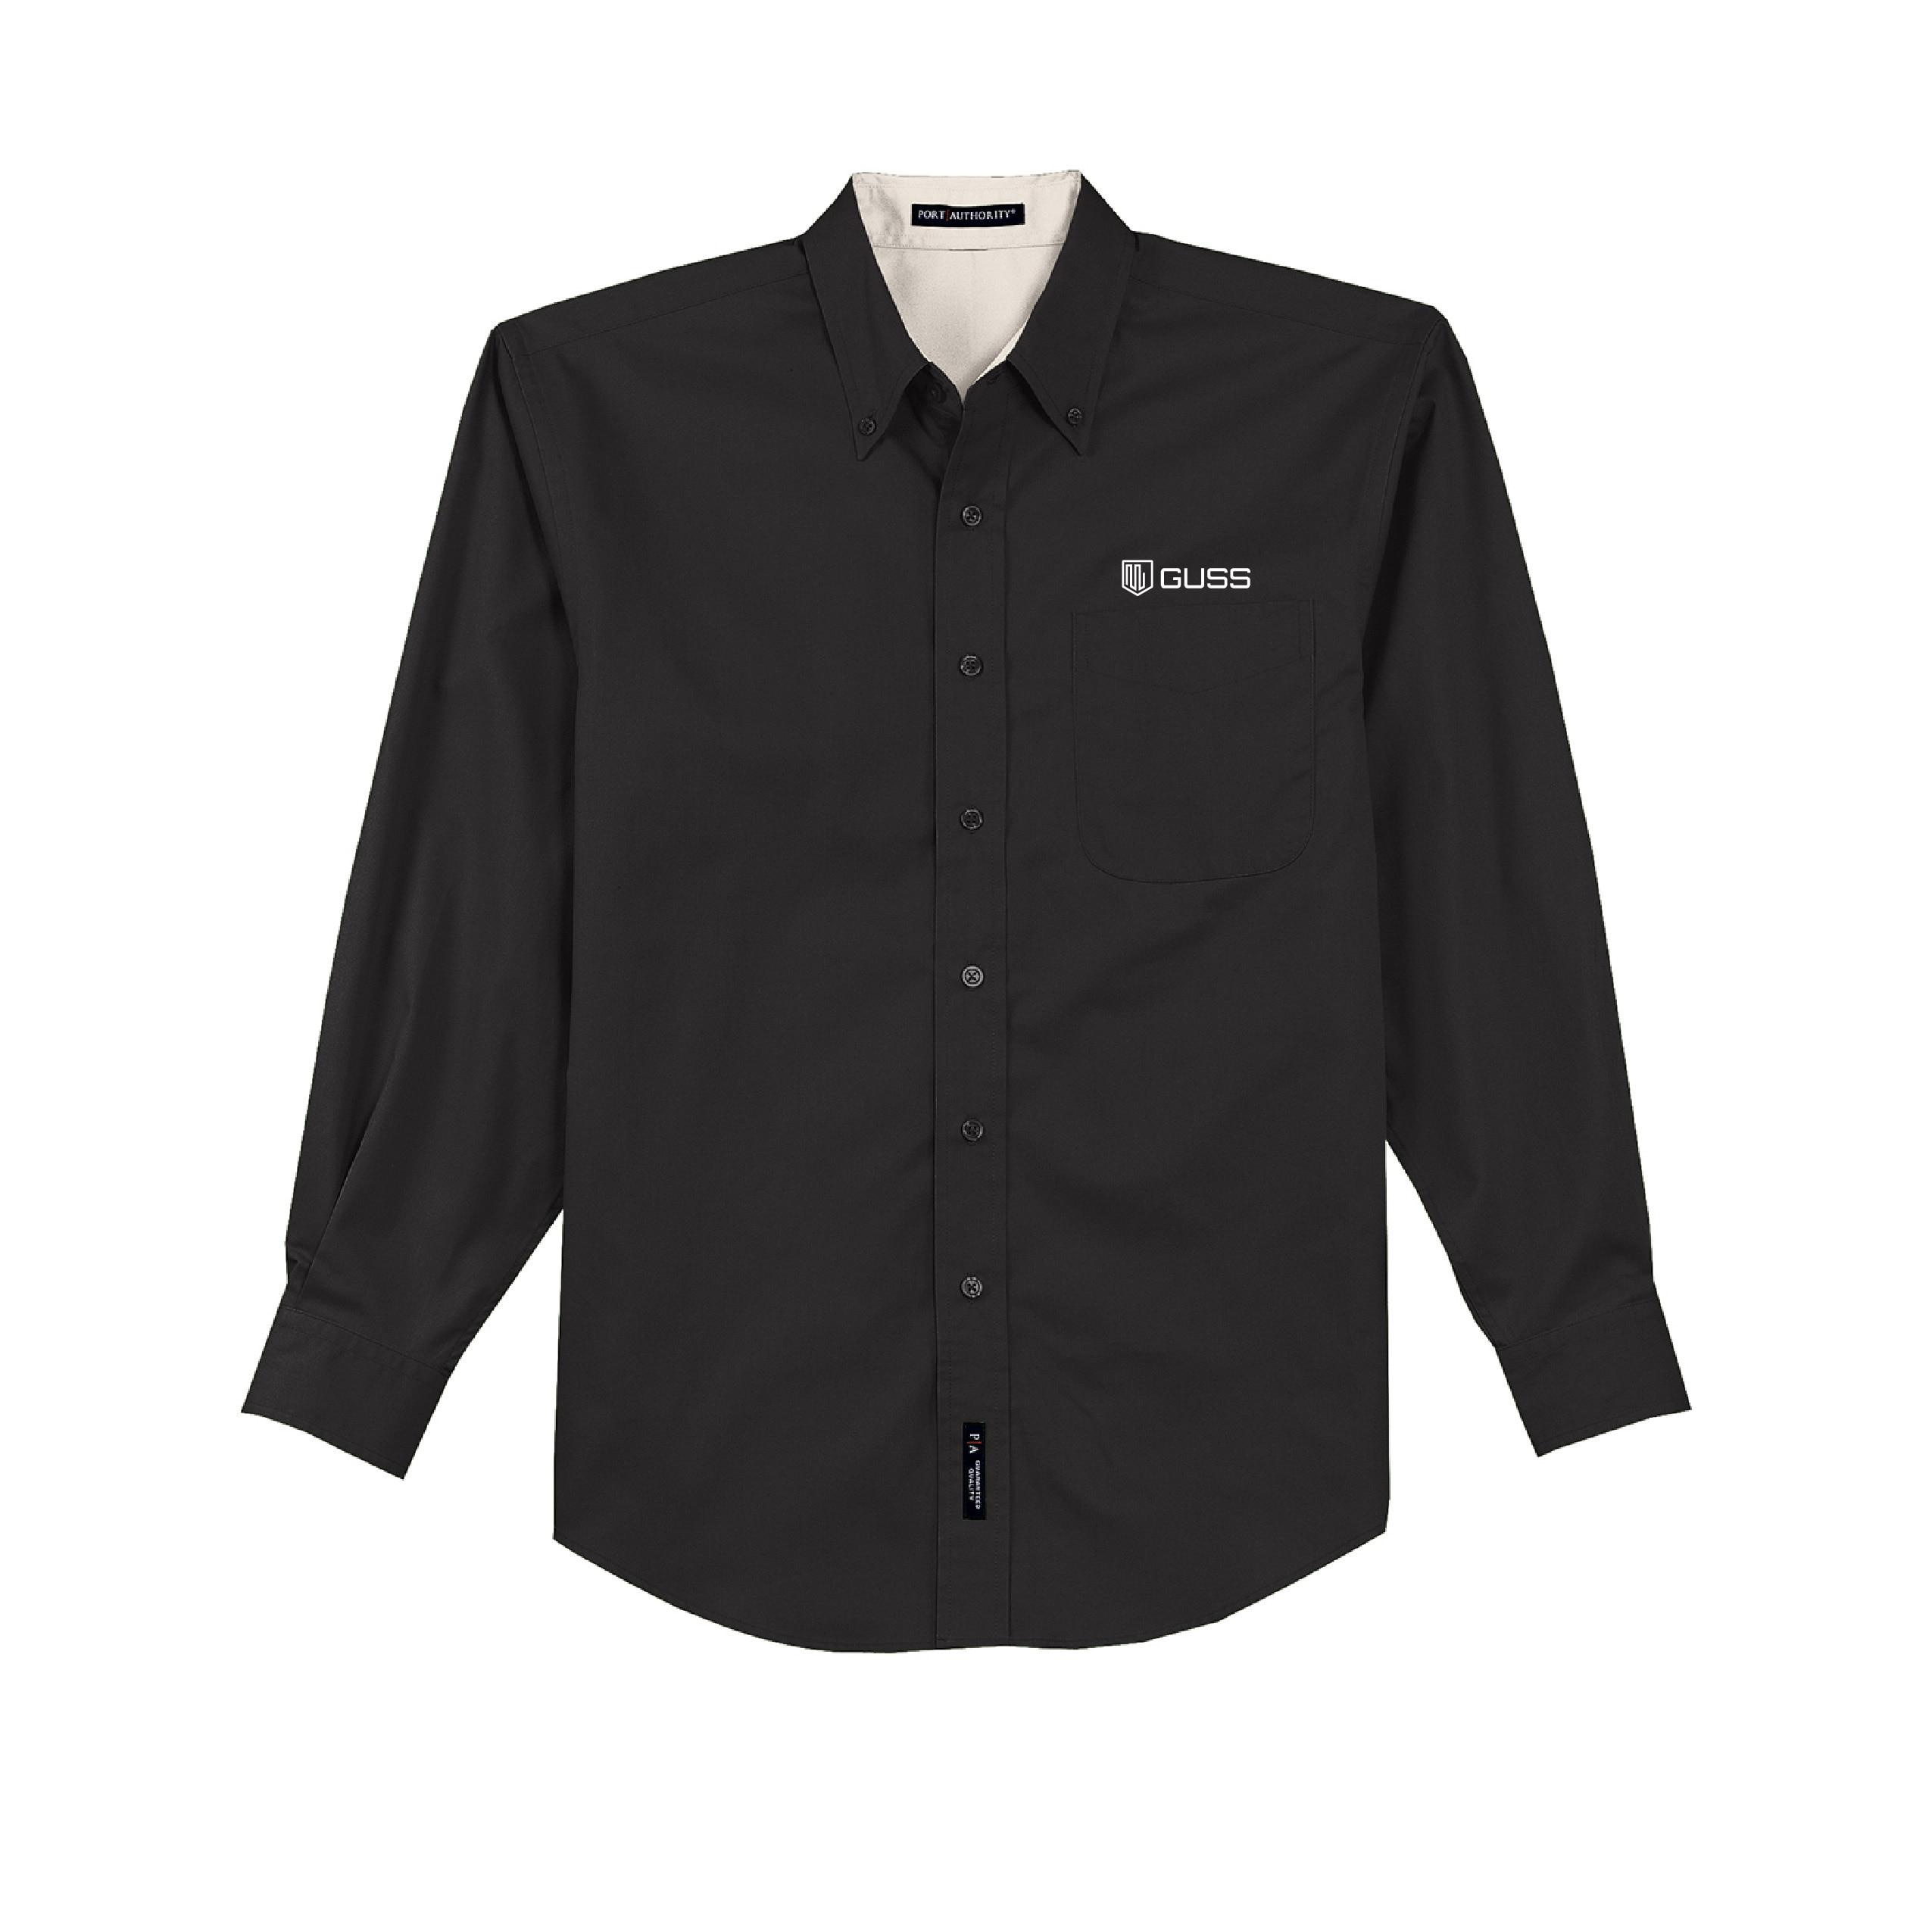 Port Authority Long Sleeve Dress Shirt